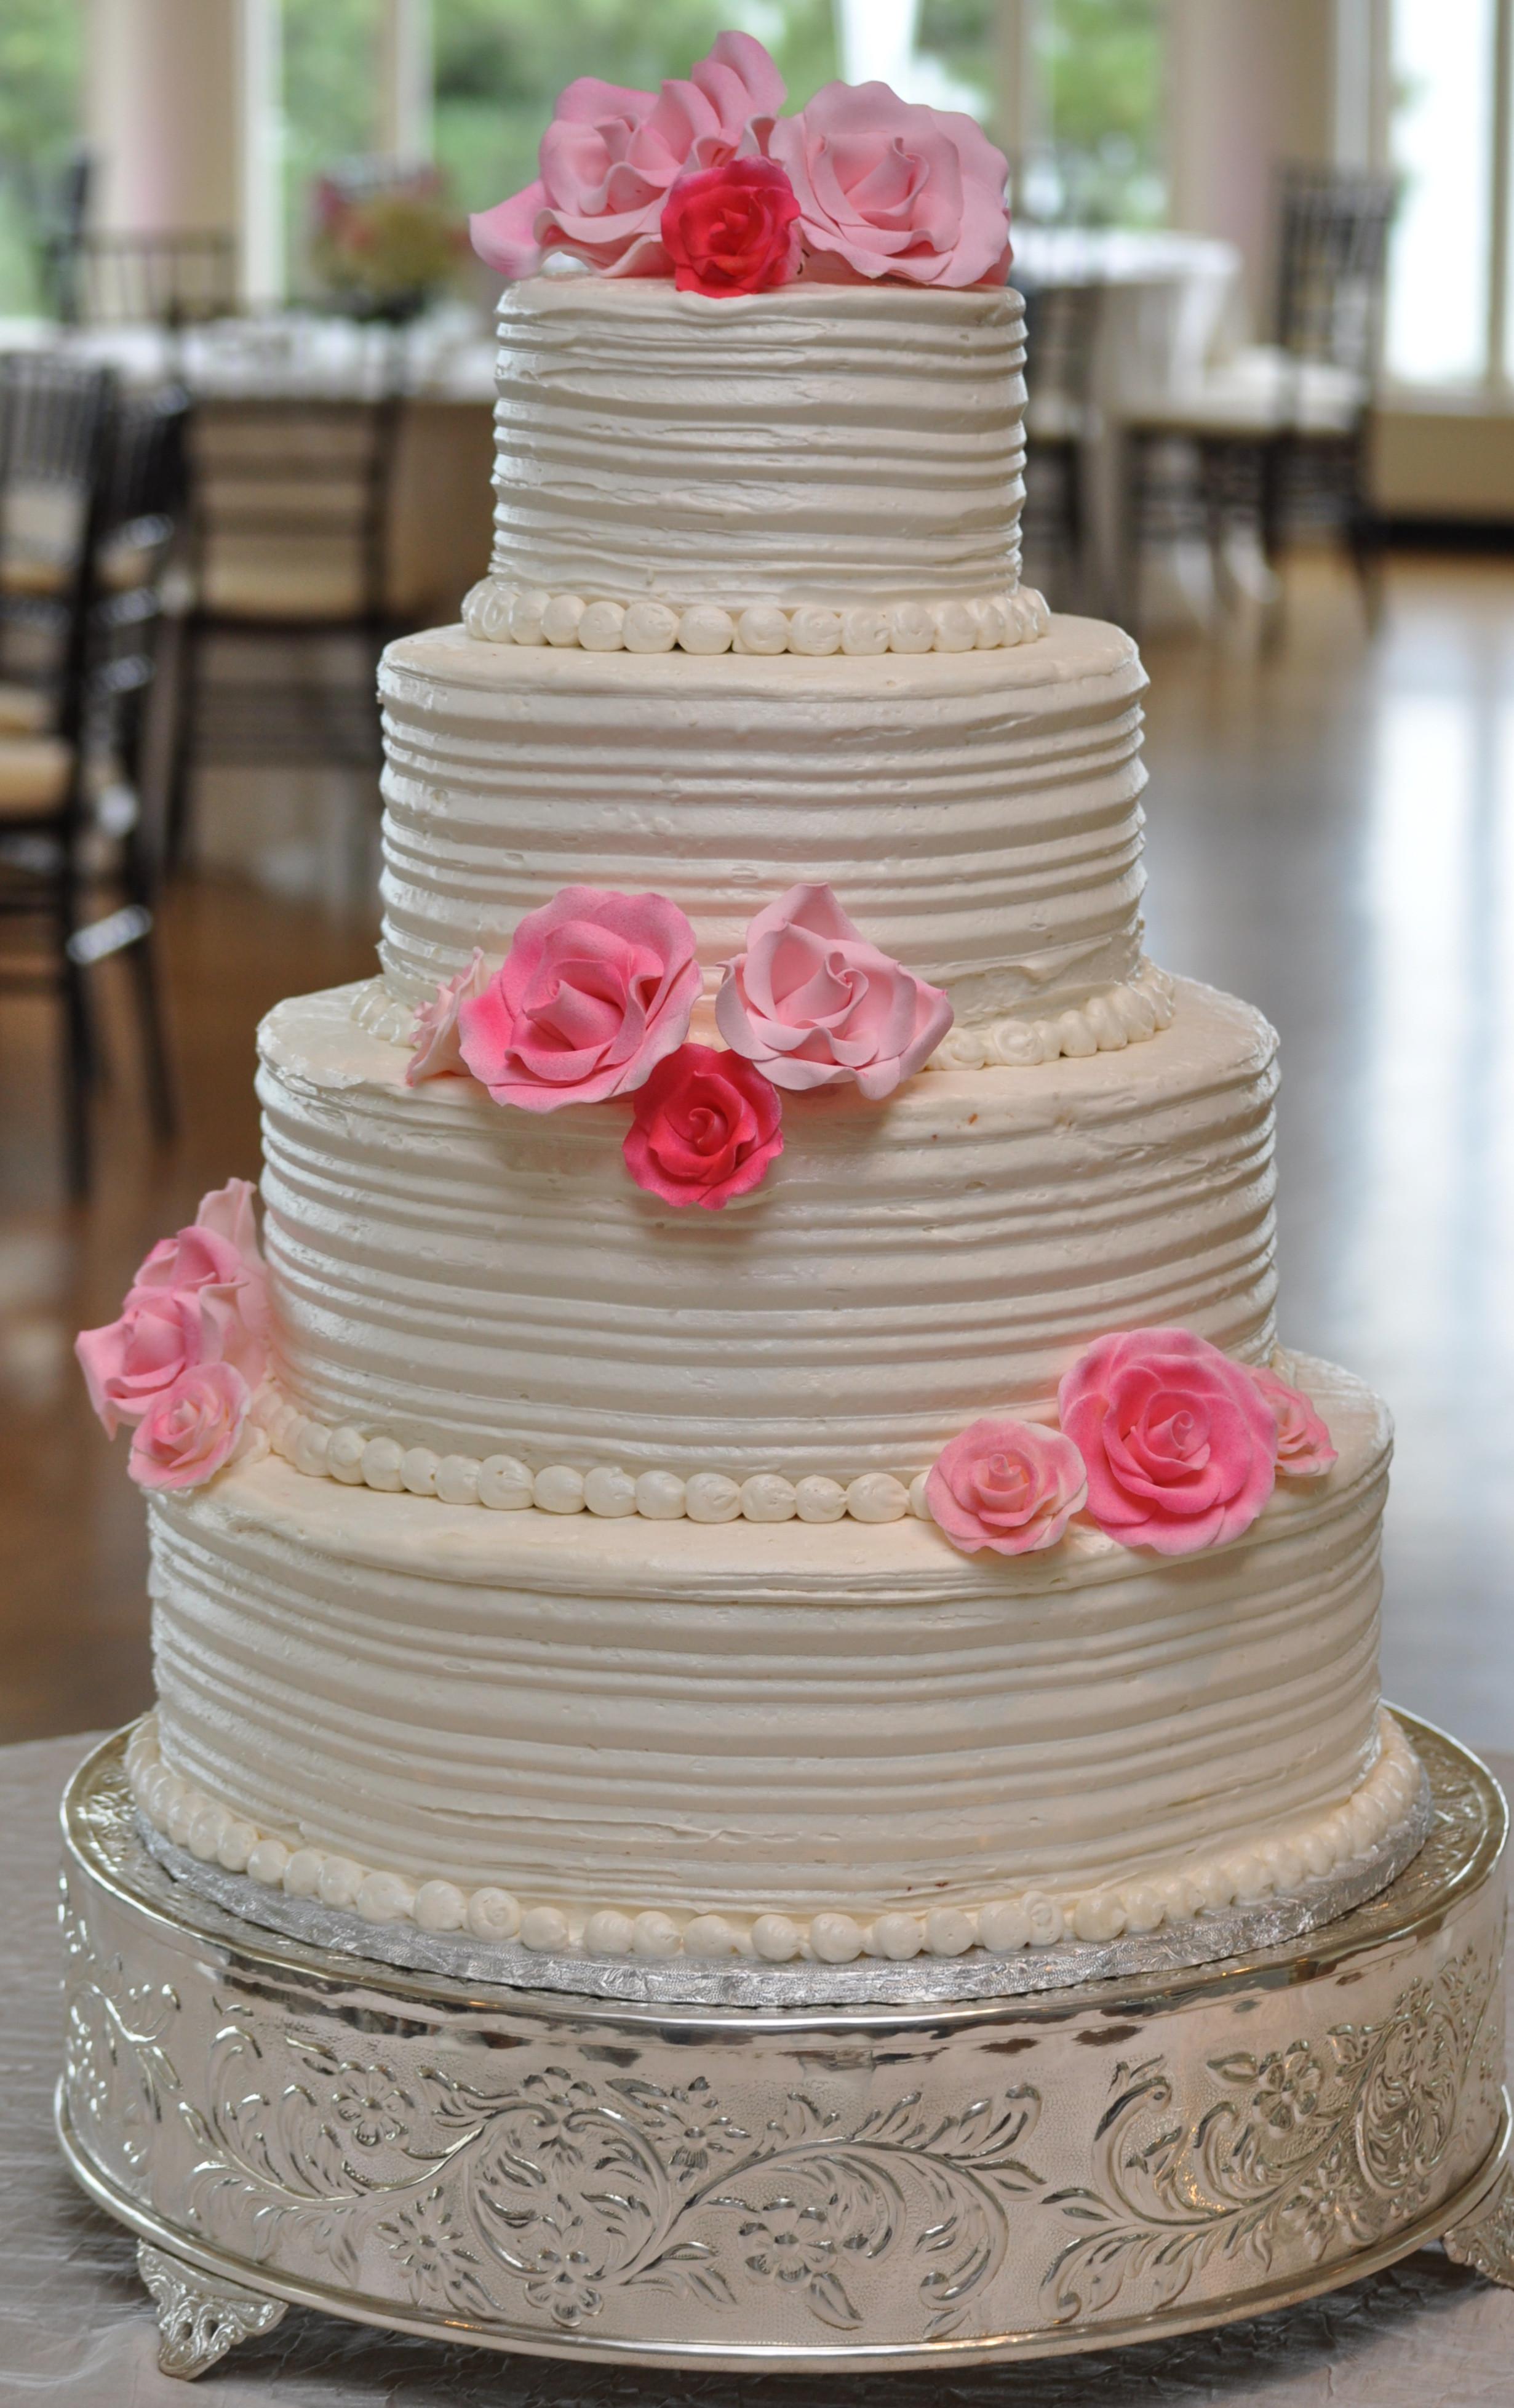 White Wedding Cake Frosting Recipes  weddinggallery4